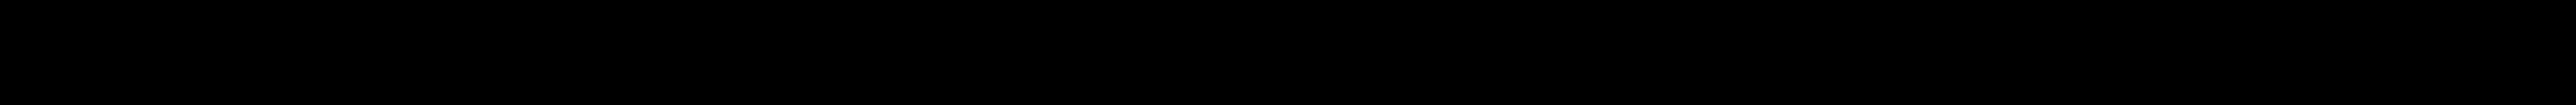 csf-1